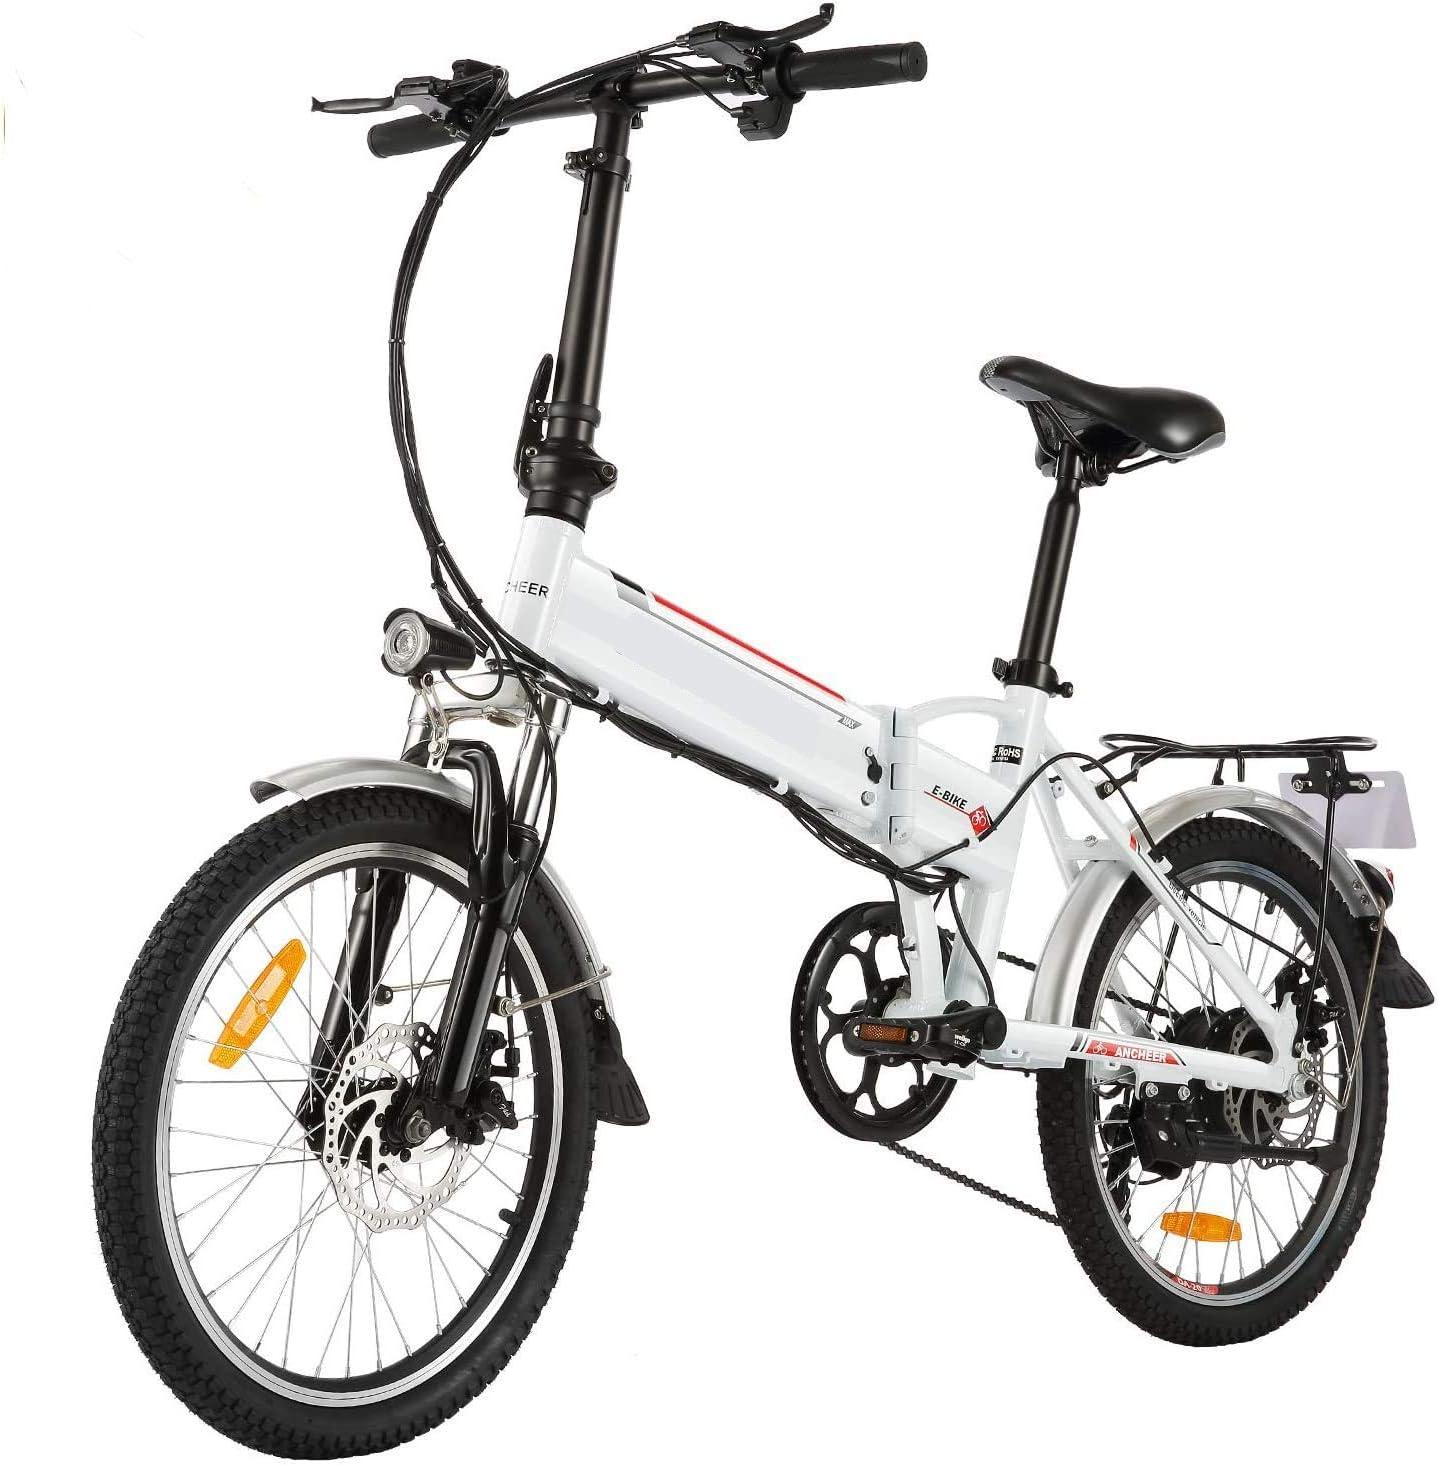 best full suspension mountain bike under 2000: Speedrid Electric Mountain Bike